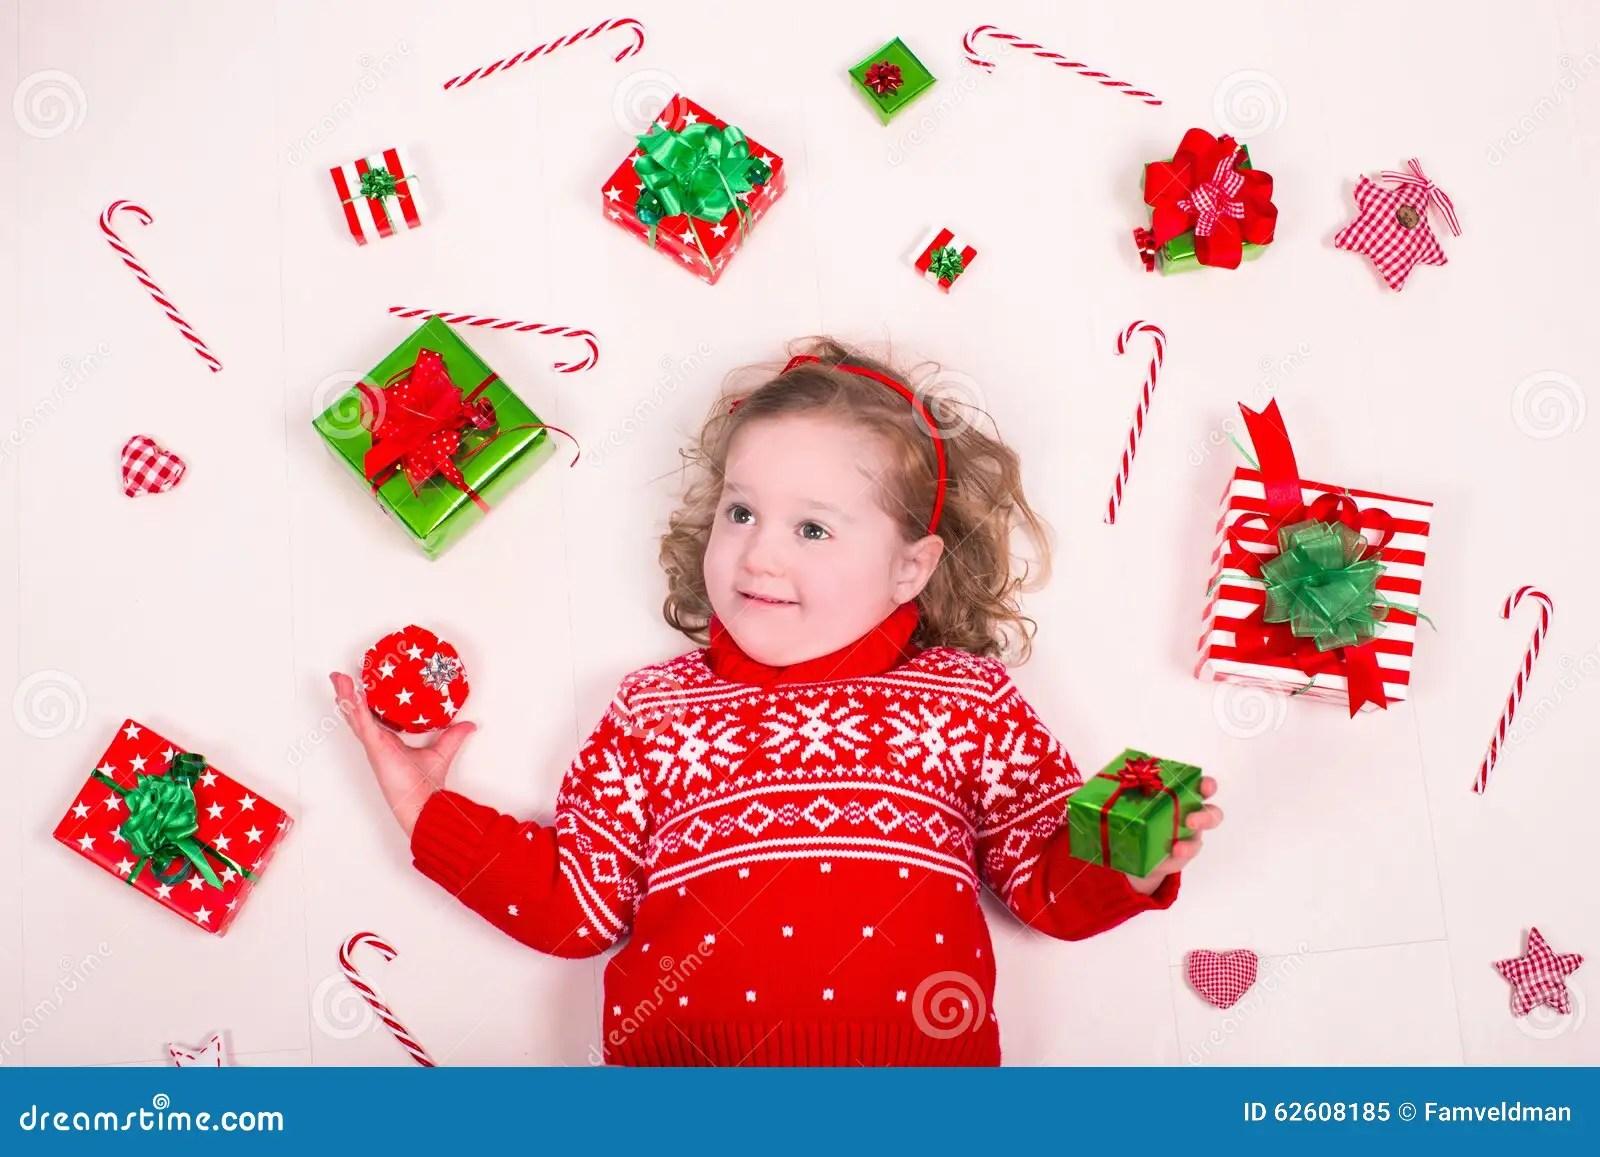 Youth Christmas Gift